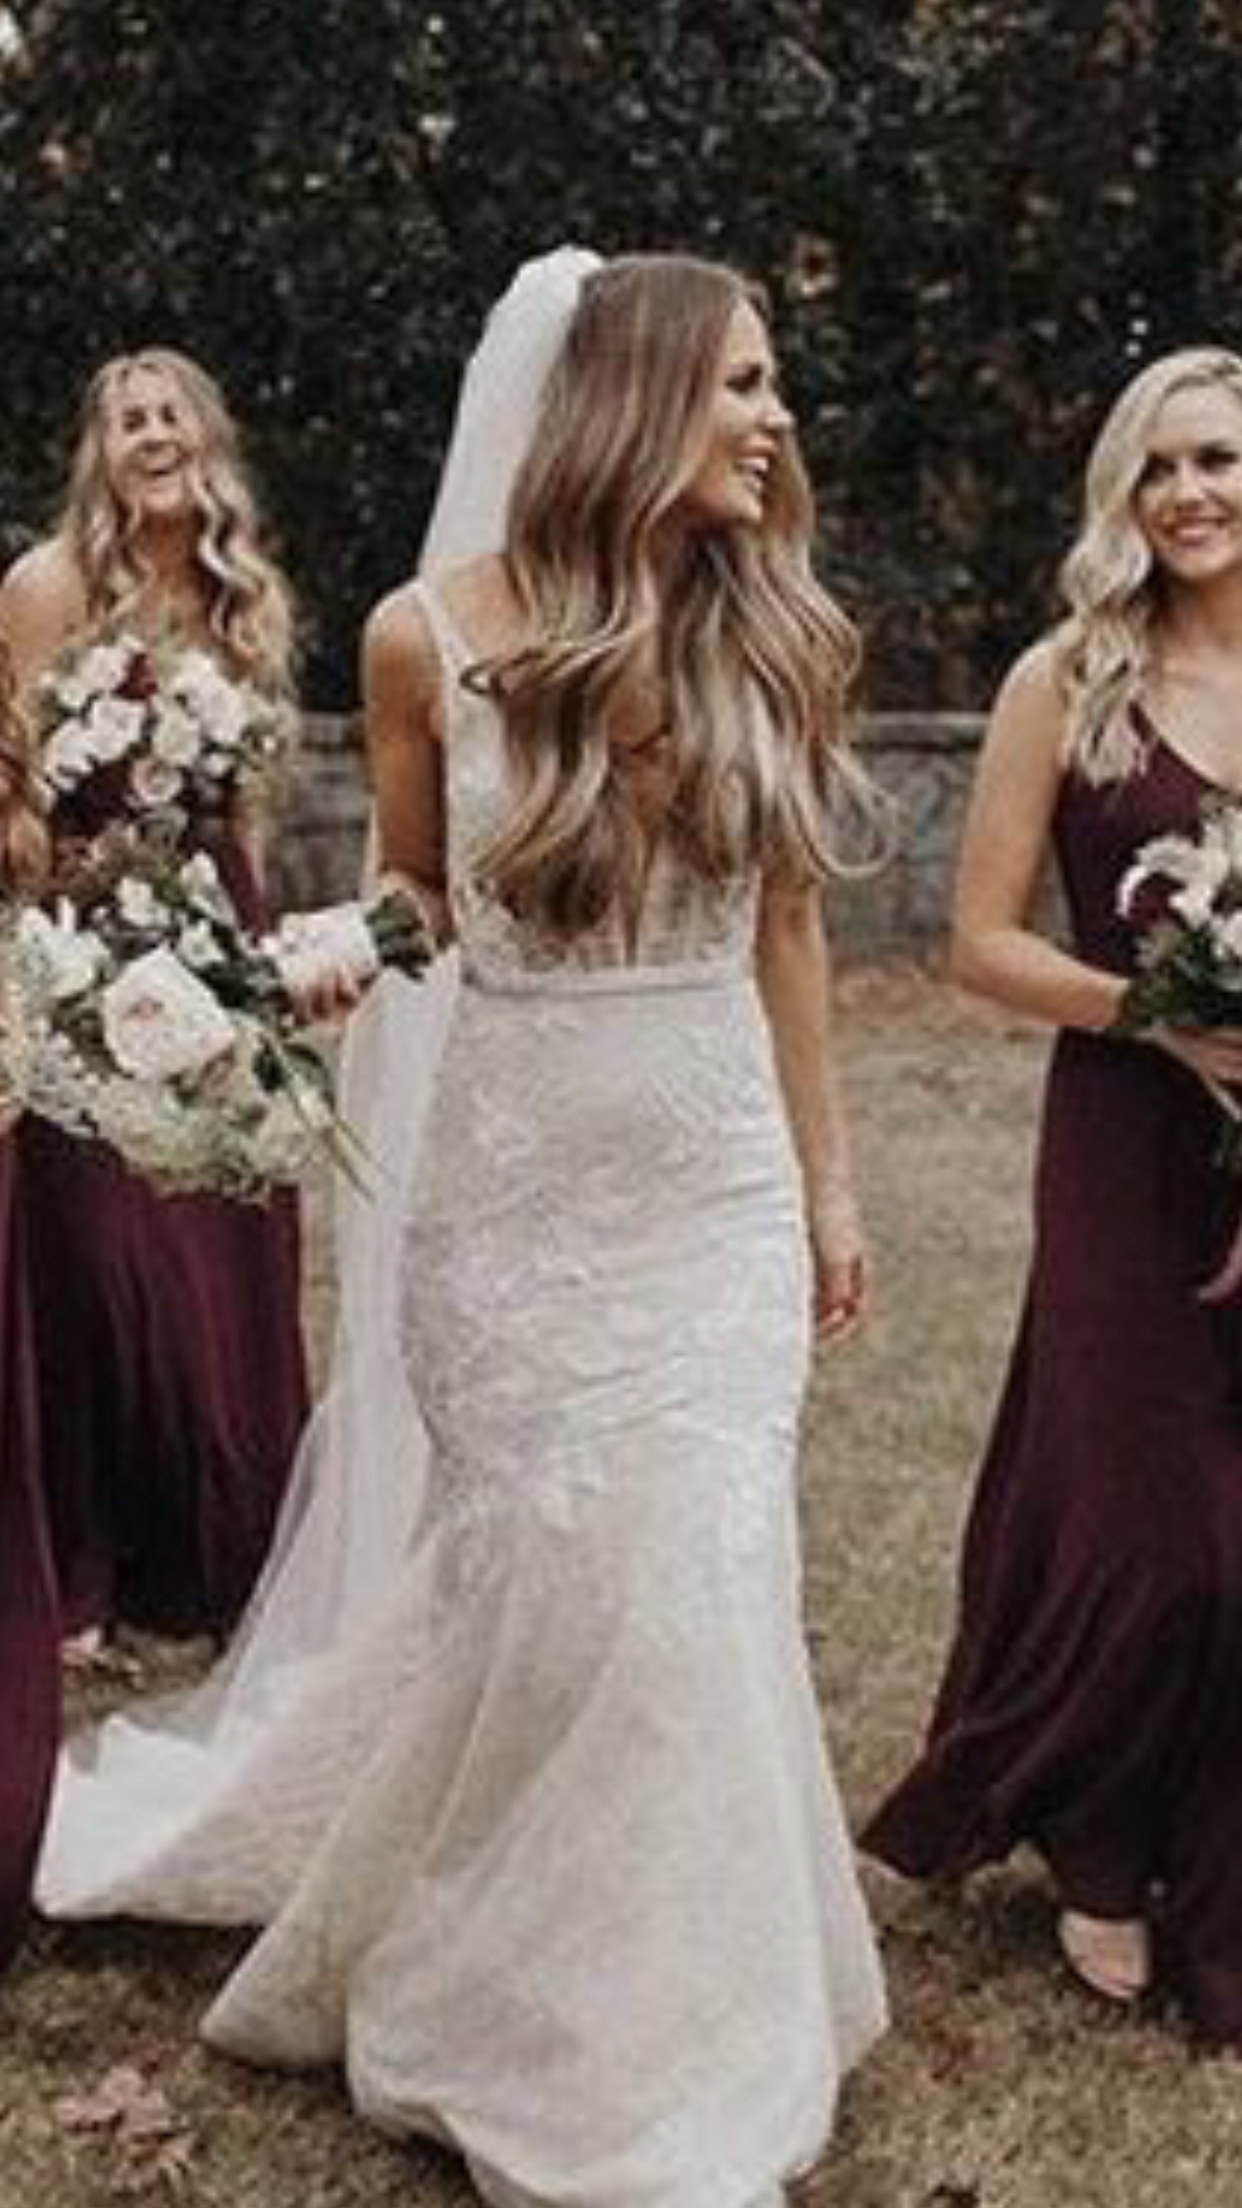 hair down, long veil | wedding in 2019 | long hair wedding